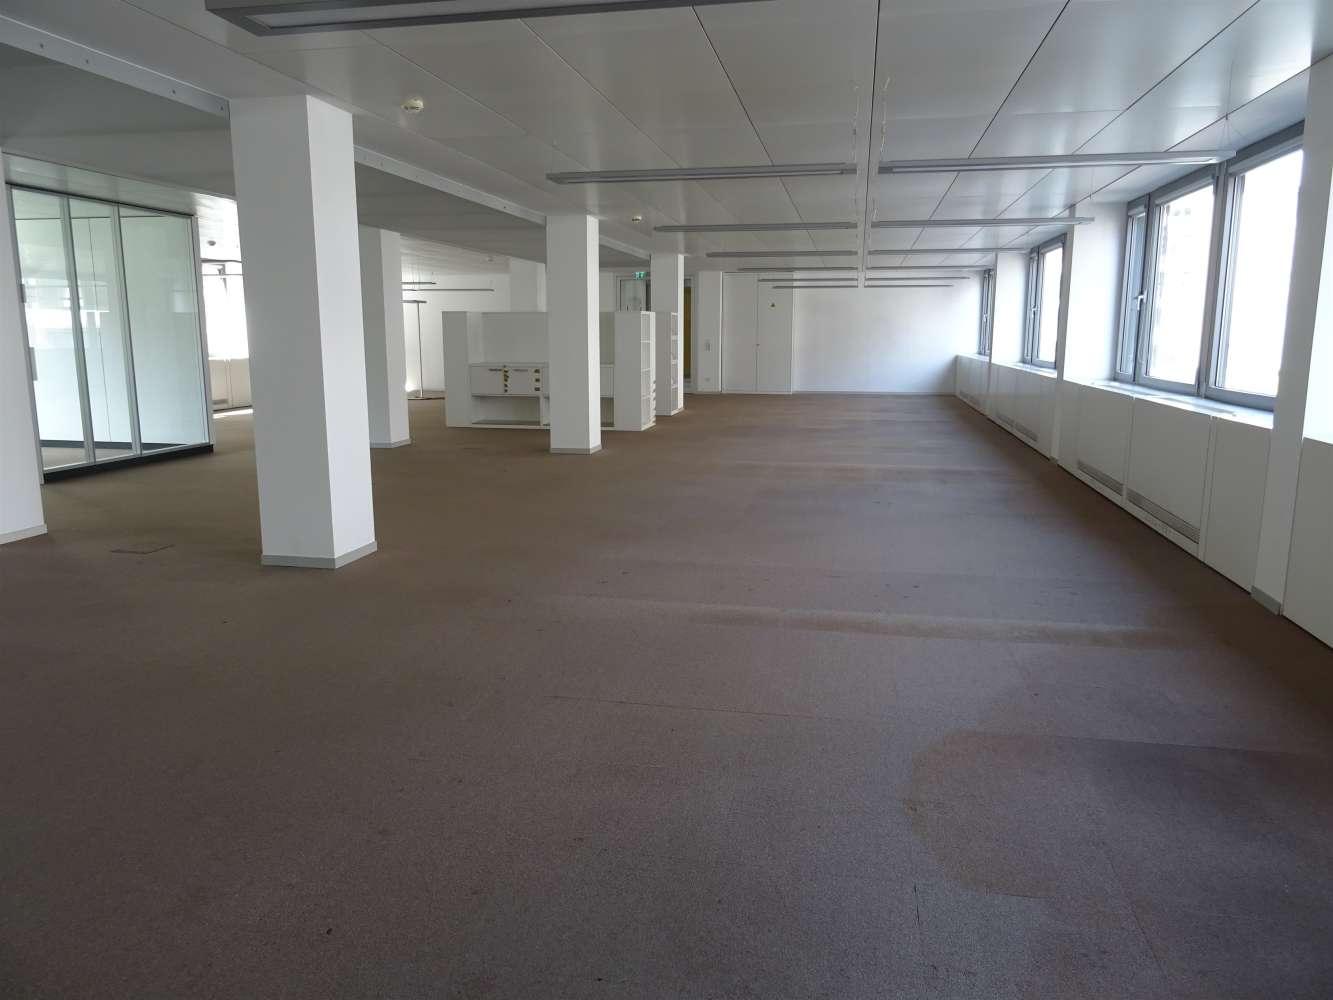 Büros Frankfurt am main, 60325 - Büro - Frankfurt am Main - F0633 - 10030224